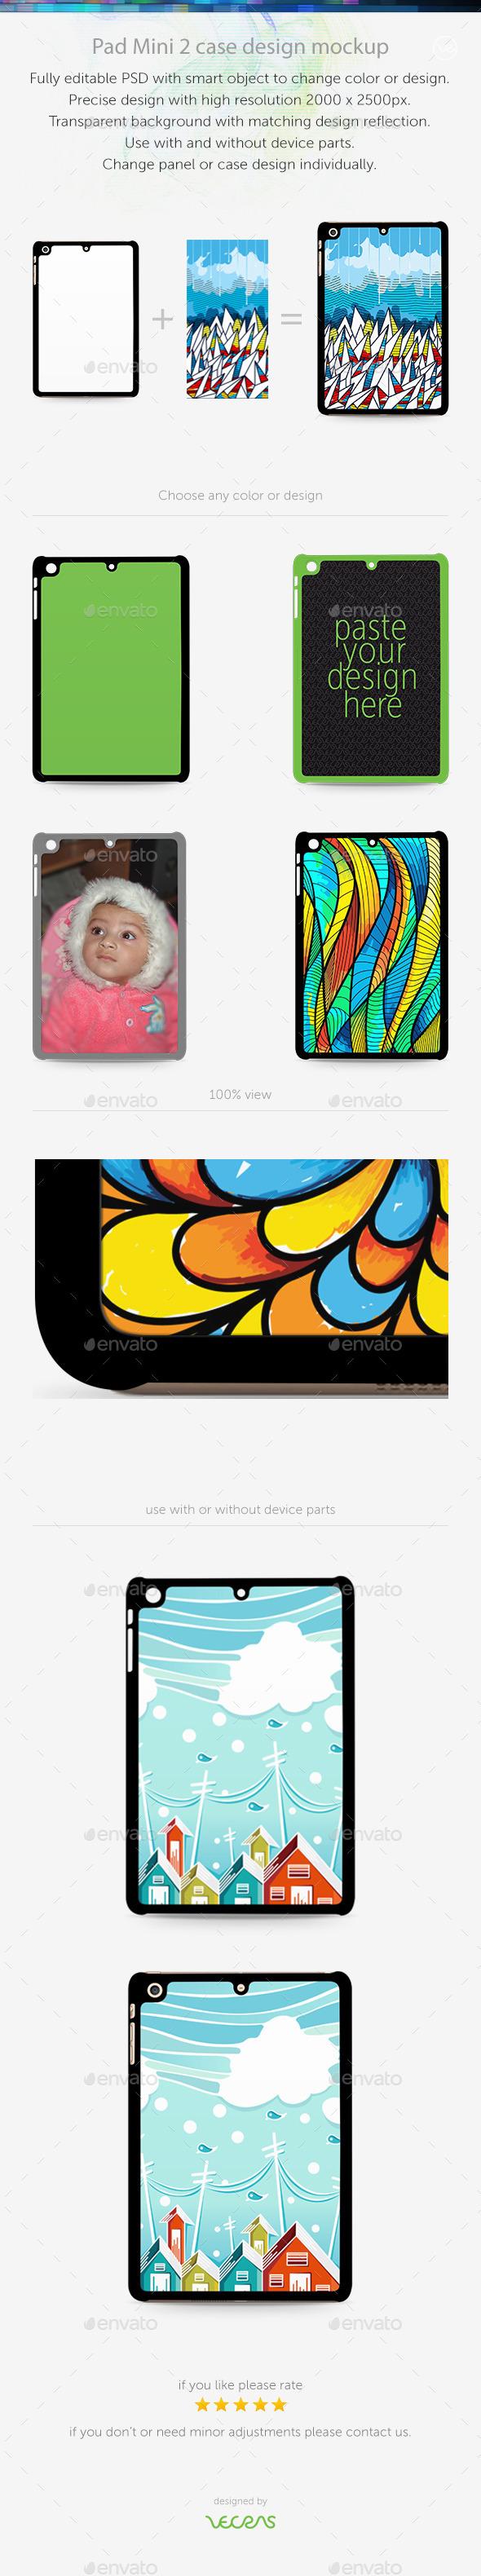 Pad Mini 2 Sticker Case Design Mockup - Mobile Displays